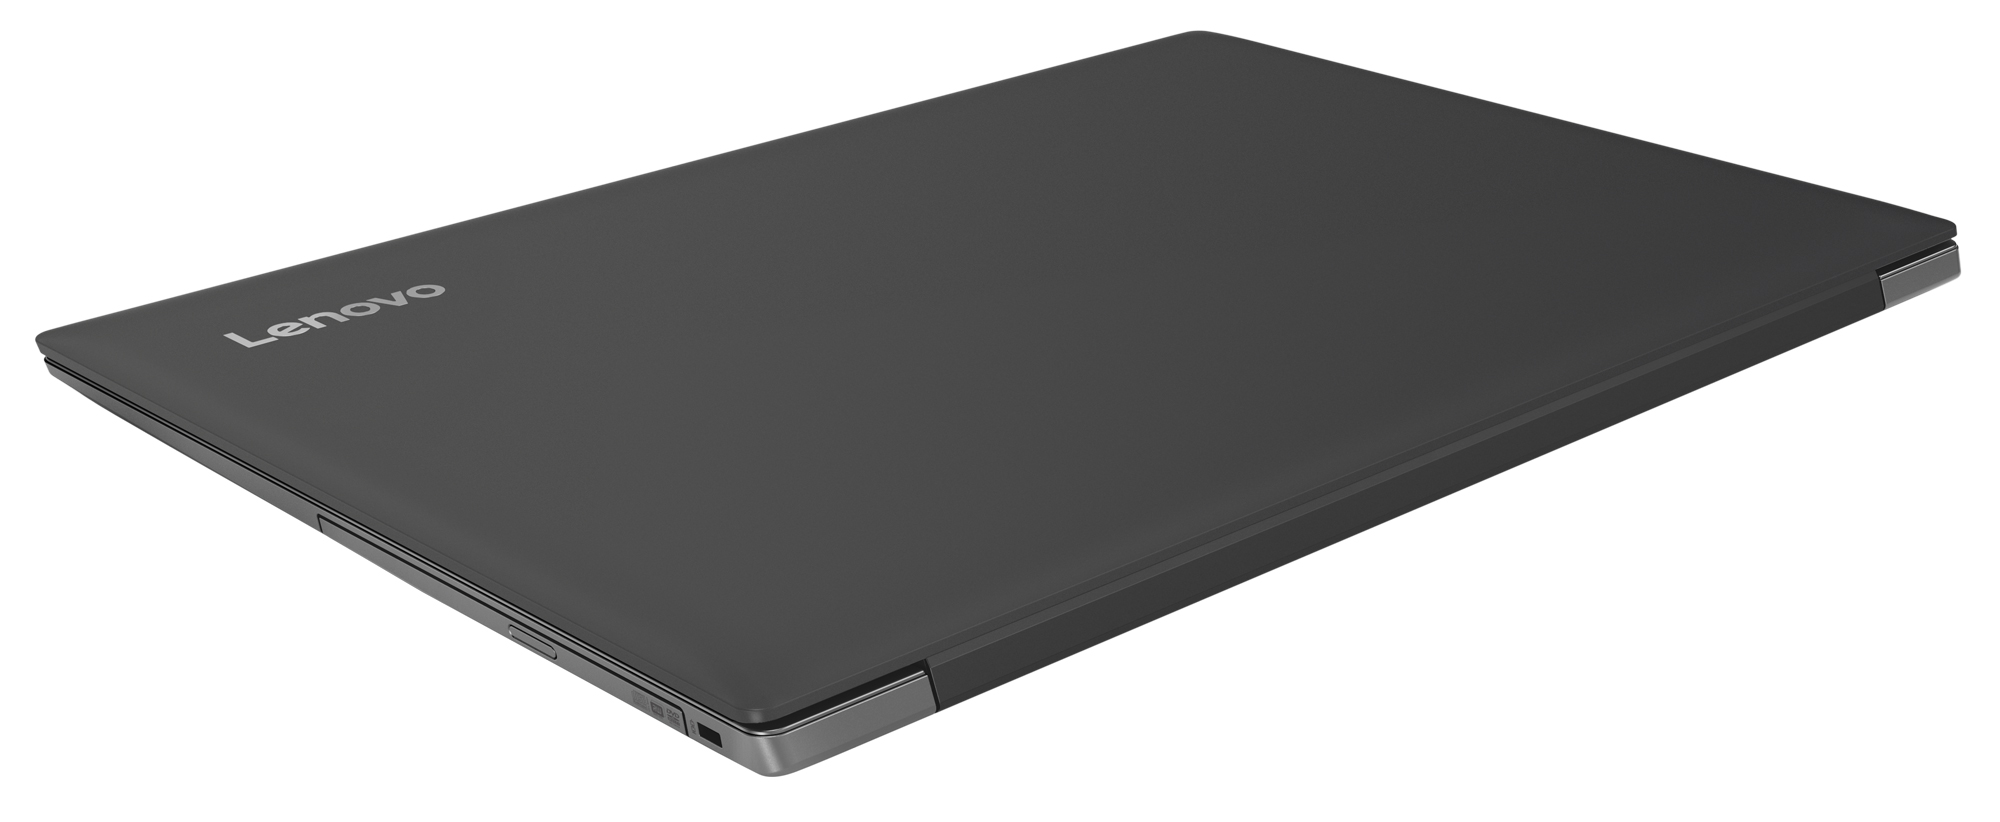 Фото  Ноутбук Lenovo ideapad 330-17IKBR Onyx Black (81DM007QRA)